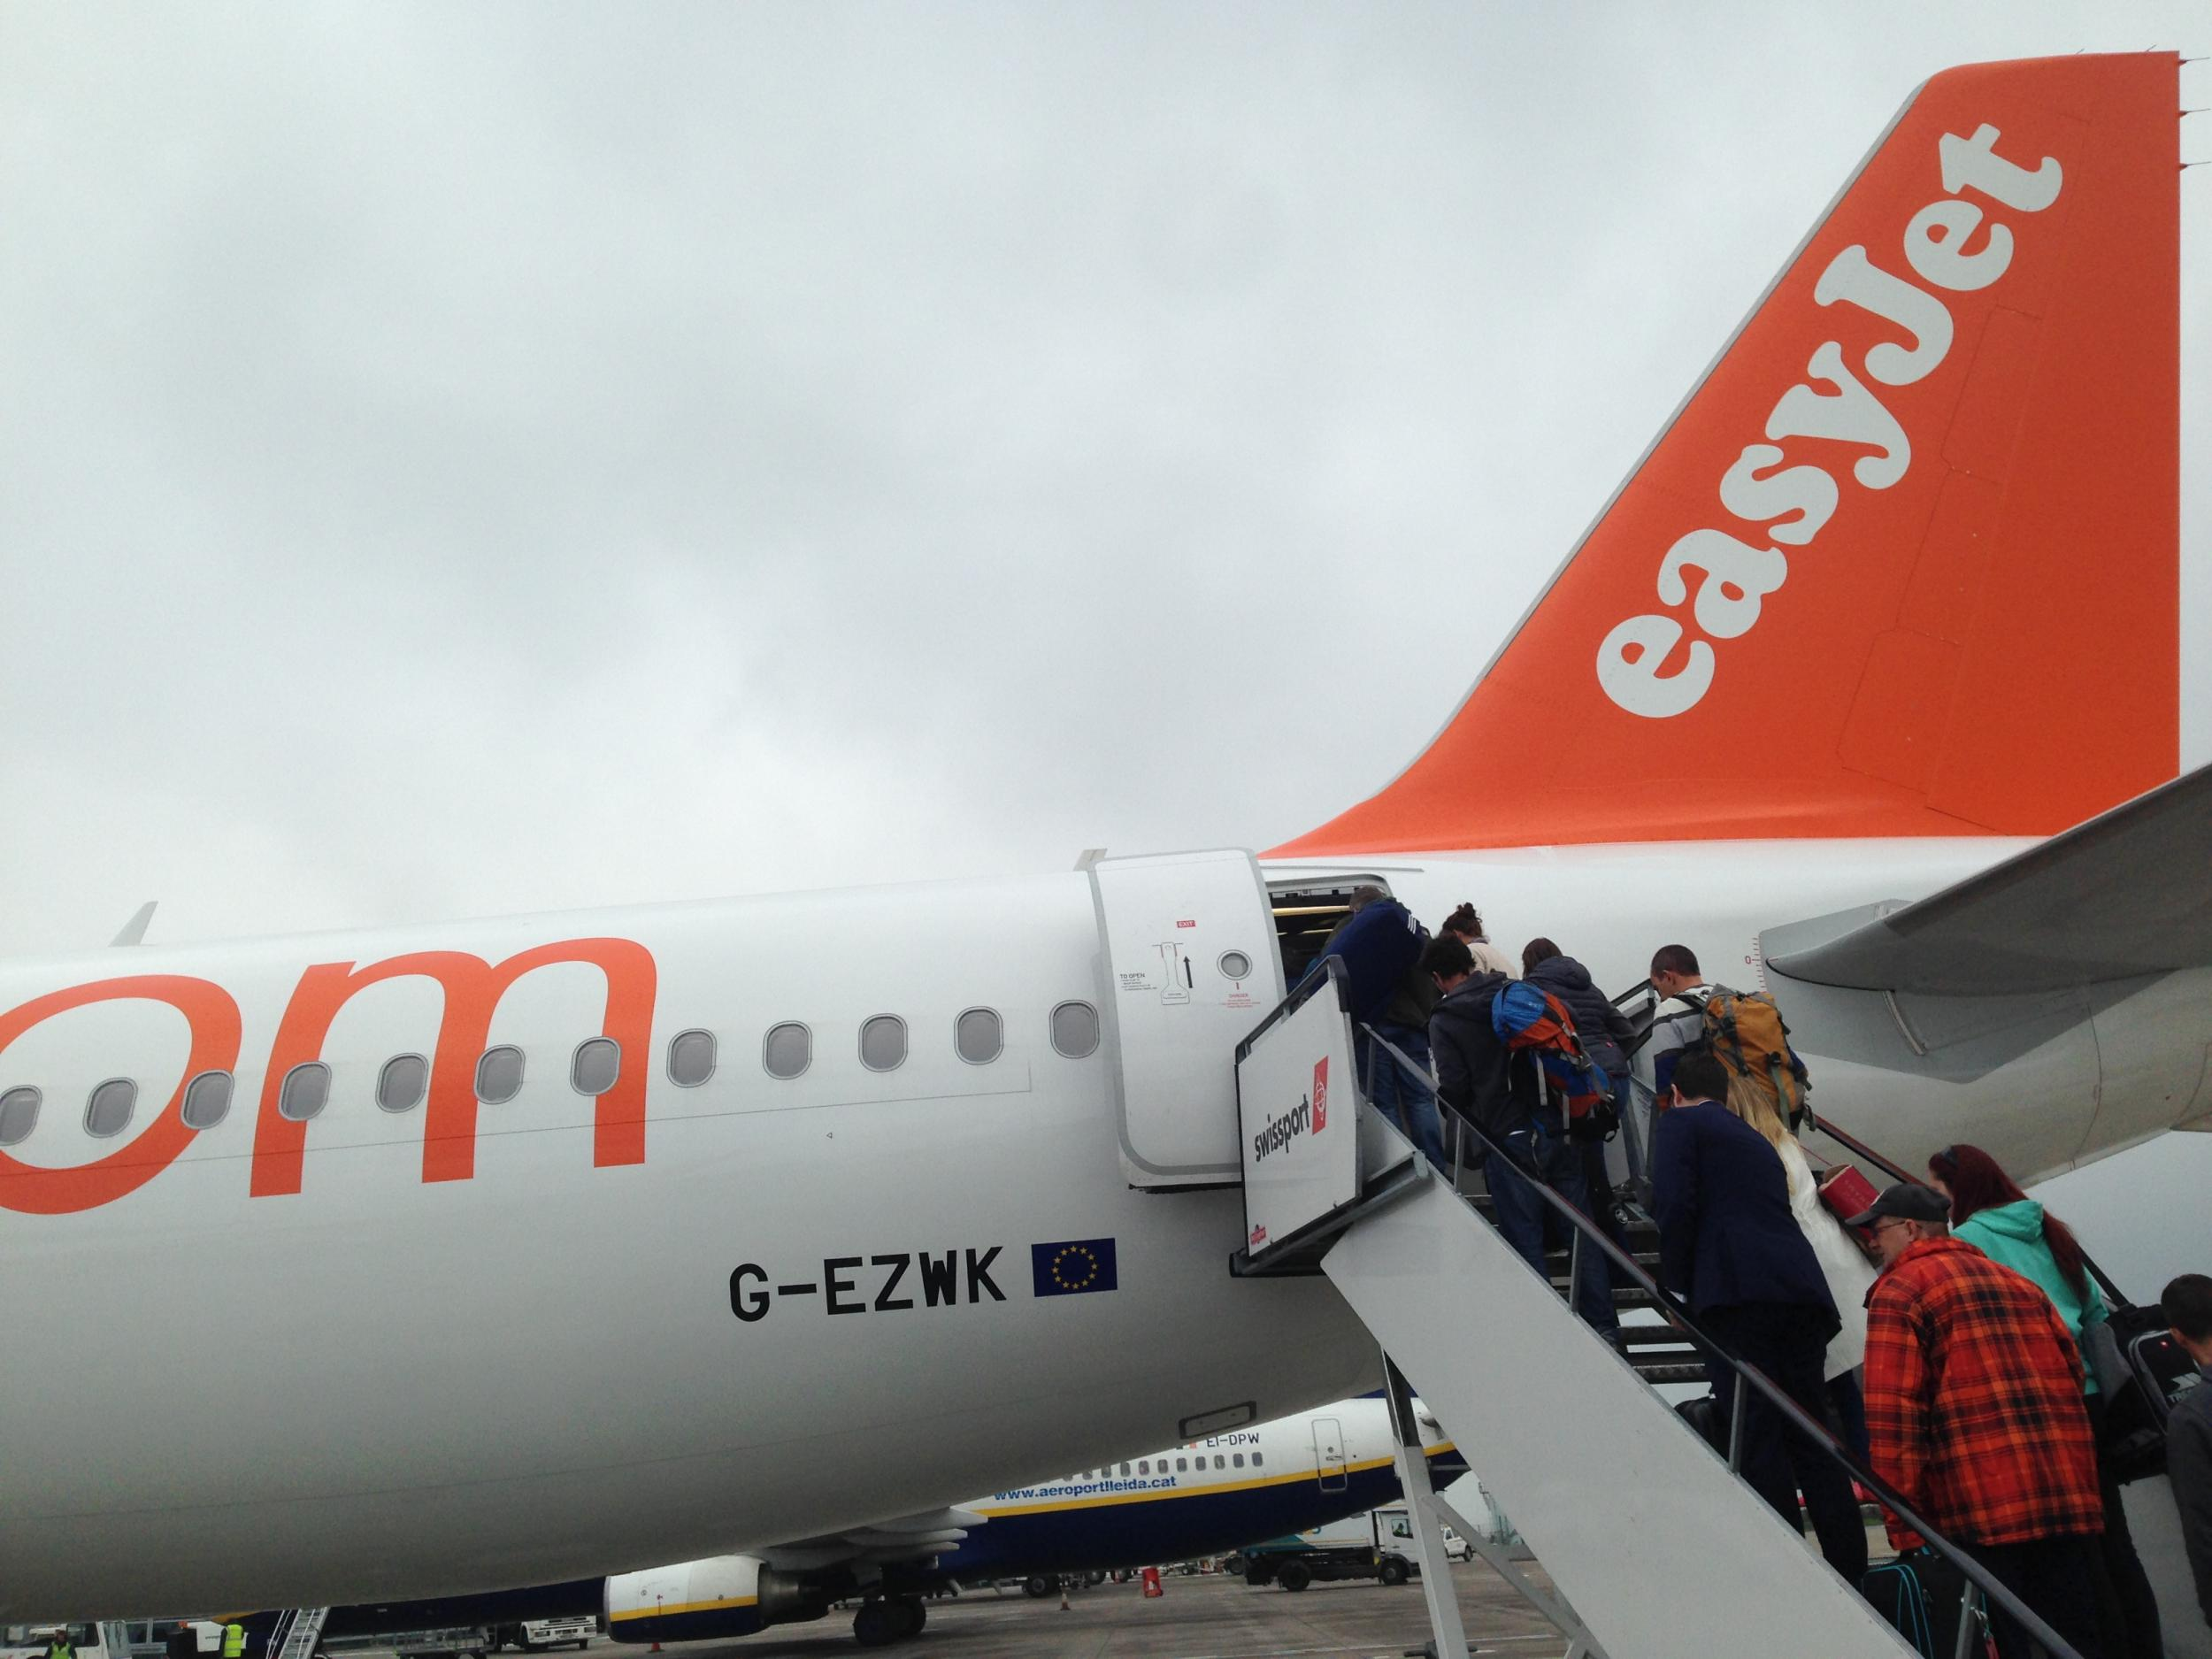 EasyJet to launch shortest mainland UK link from Birmingham to Edinb…